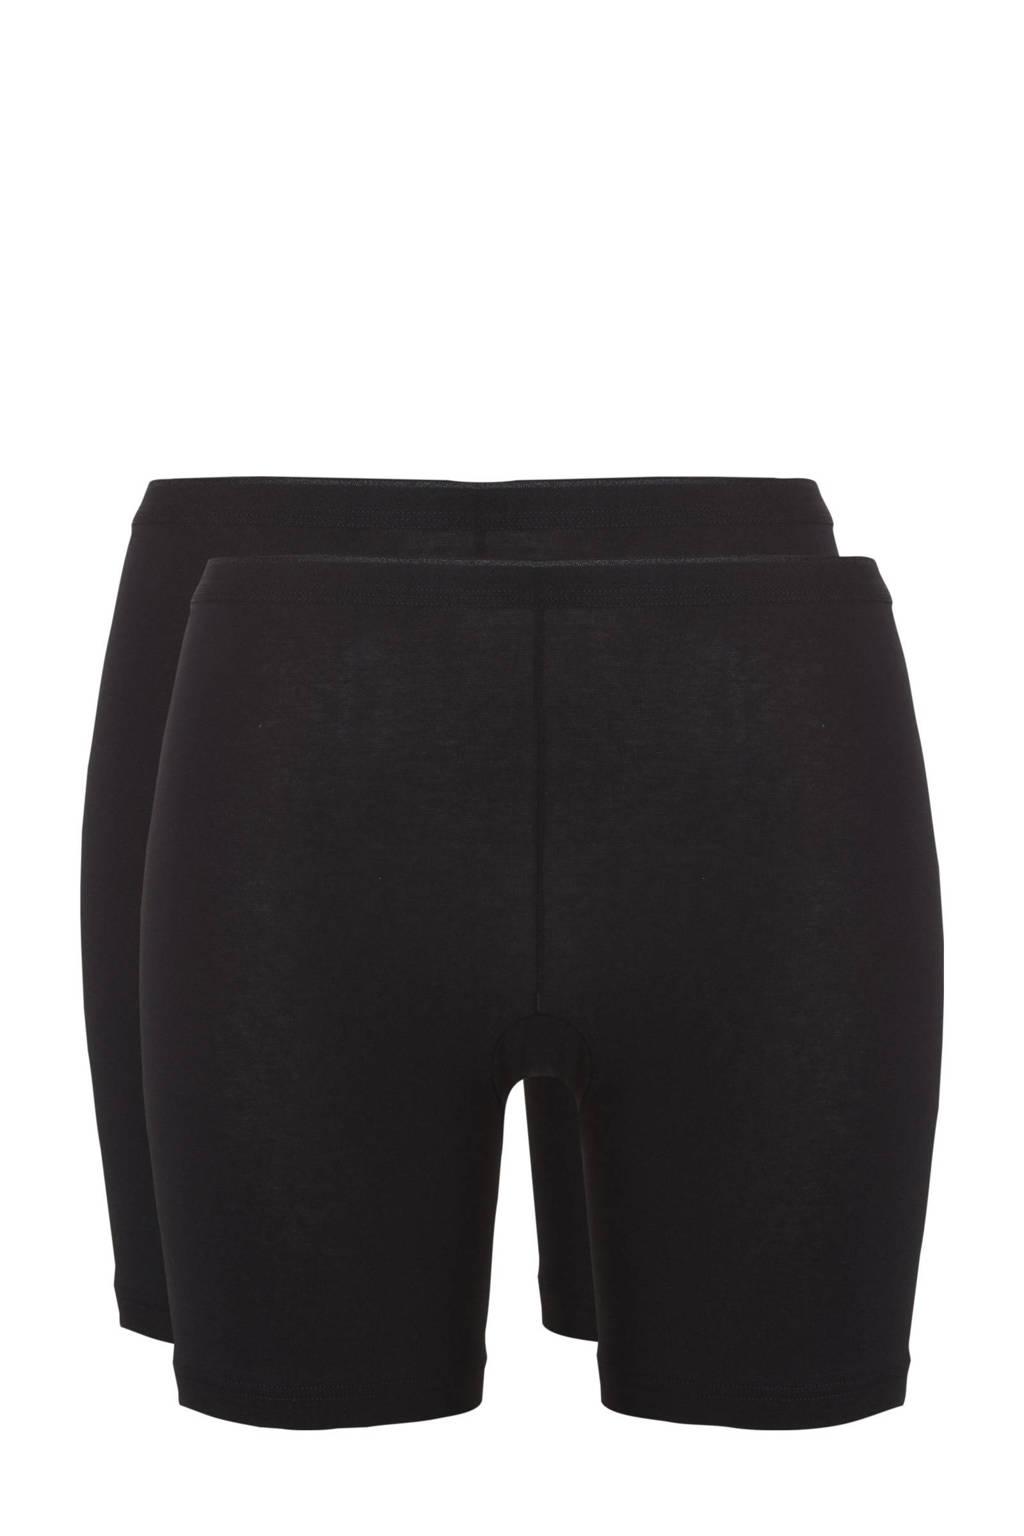 ten Cate Basic short (set van 2) zwart, Zwart